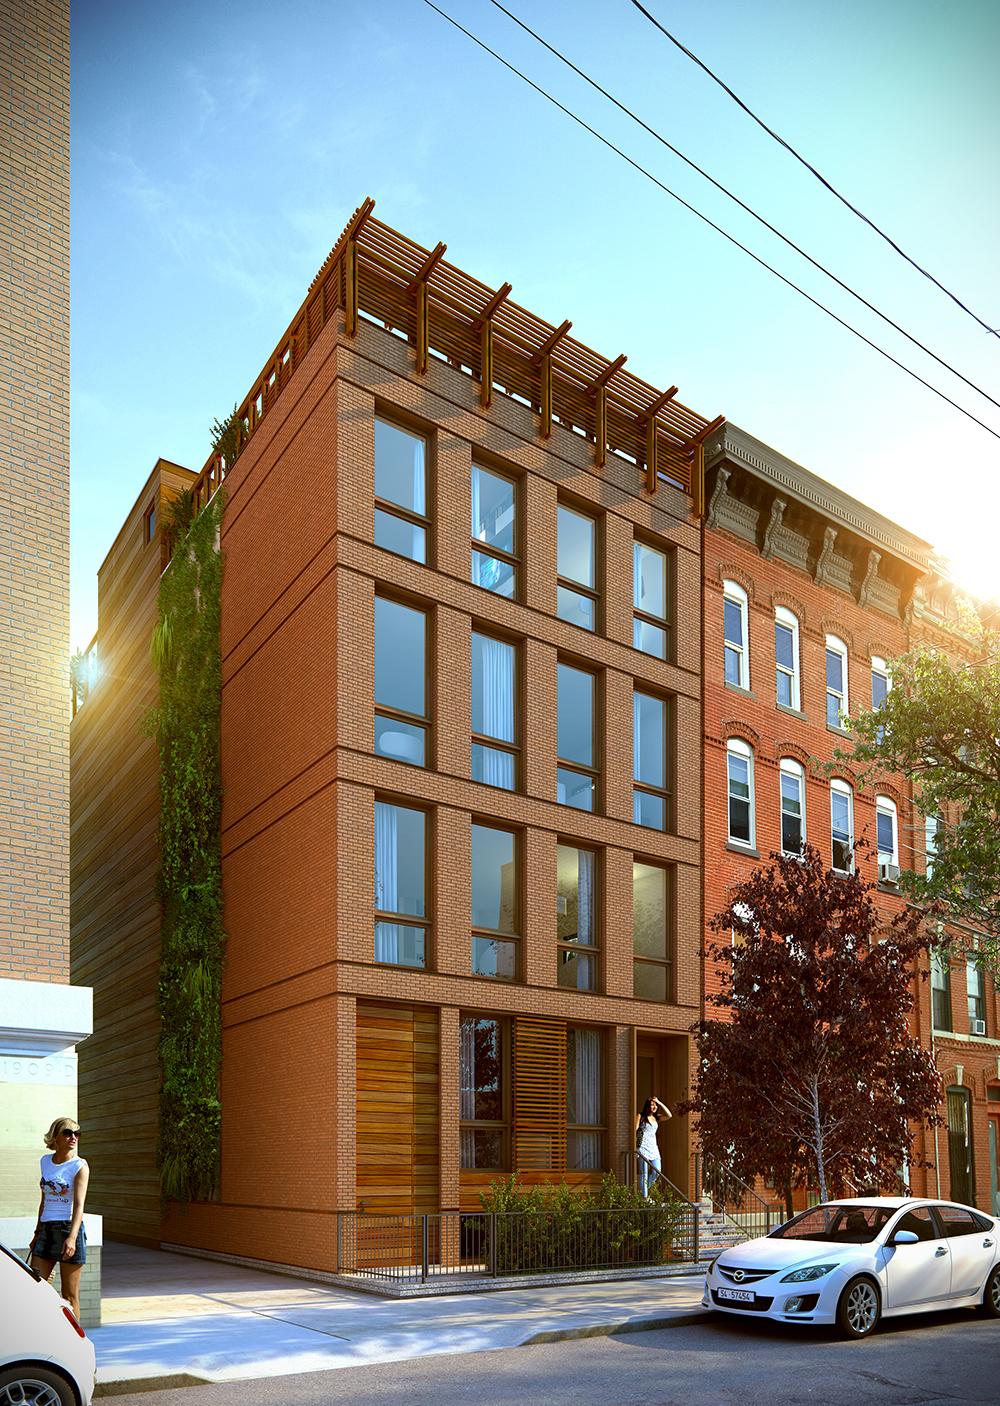 Rendering of 54 Bright Street, by Jorge Mastropietro Architects Atelier